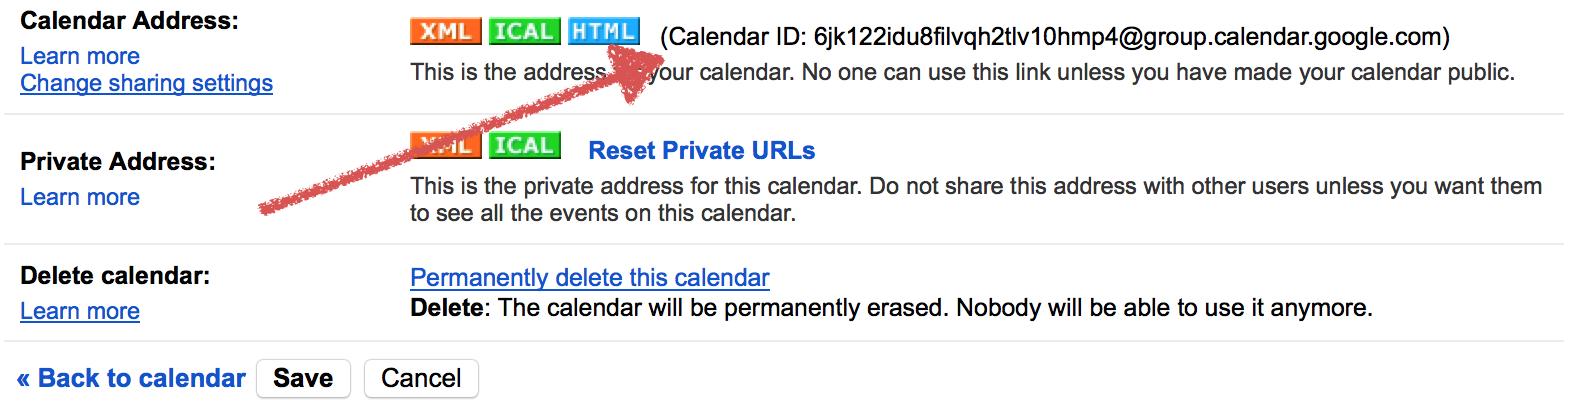 GANTTplanner Blog: How to use Google Calendar to plan staff